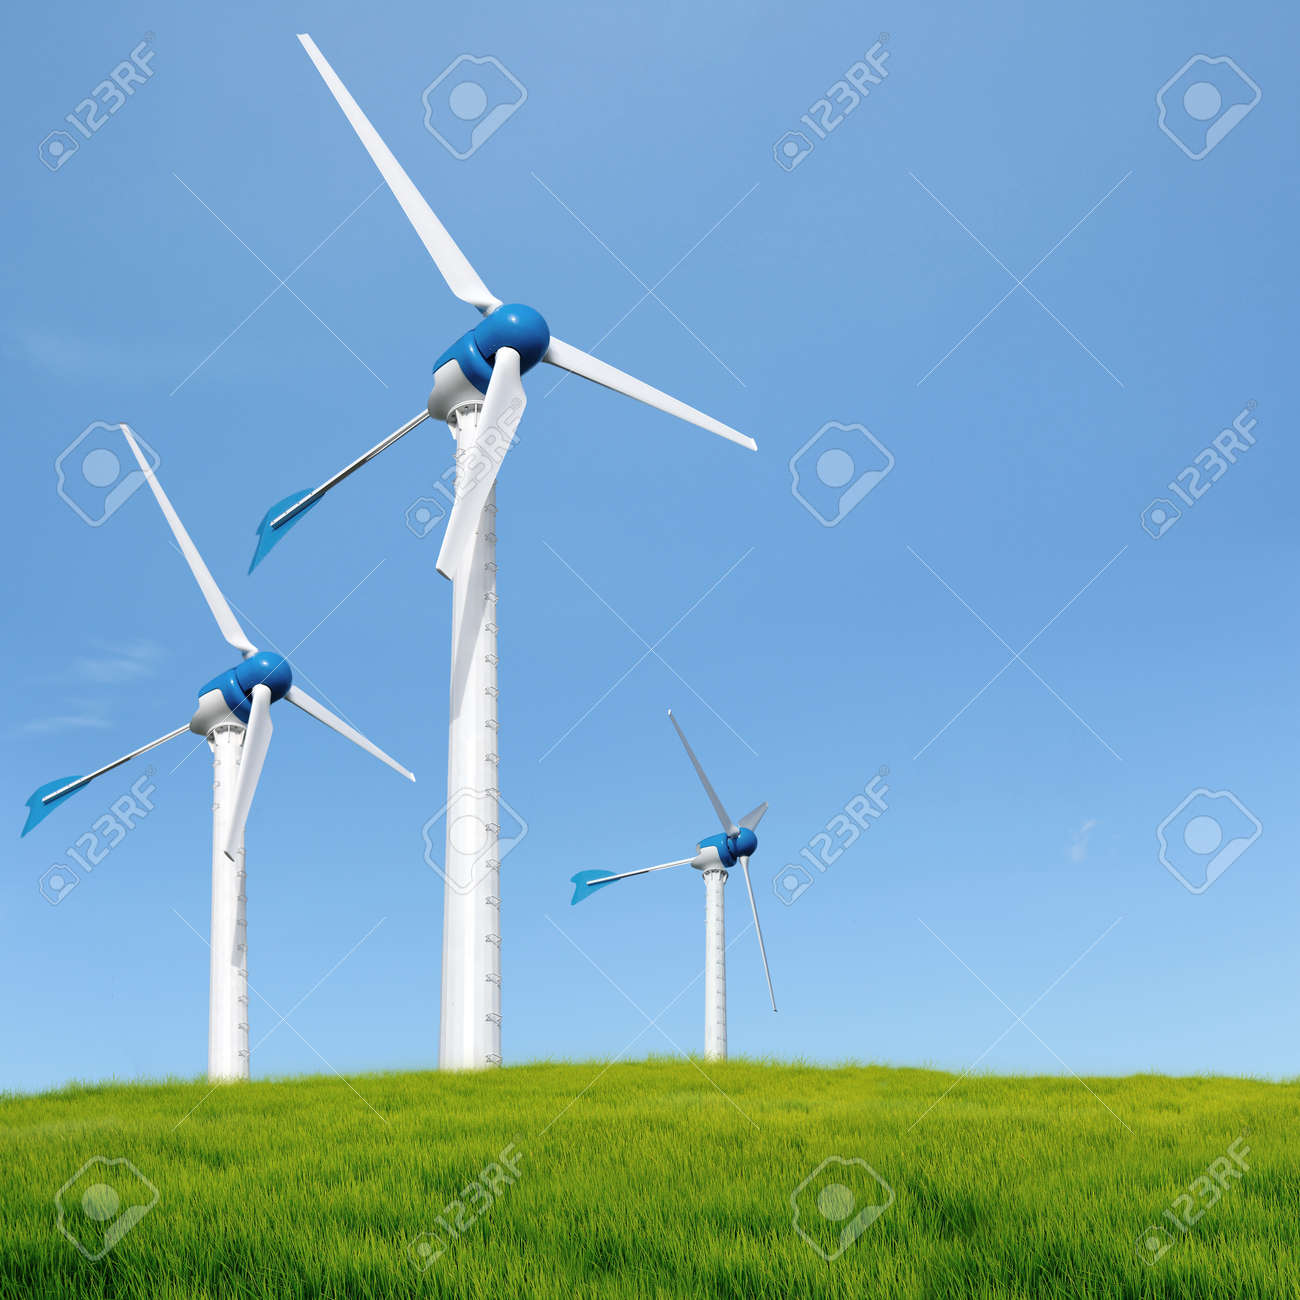 Wind turbines in an open field on cloudy day - 14154350